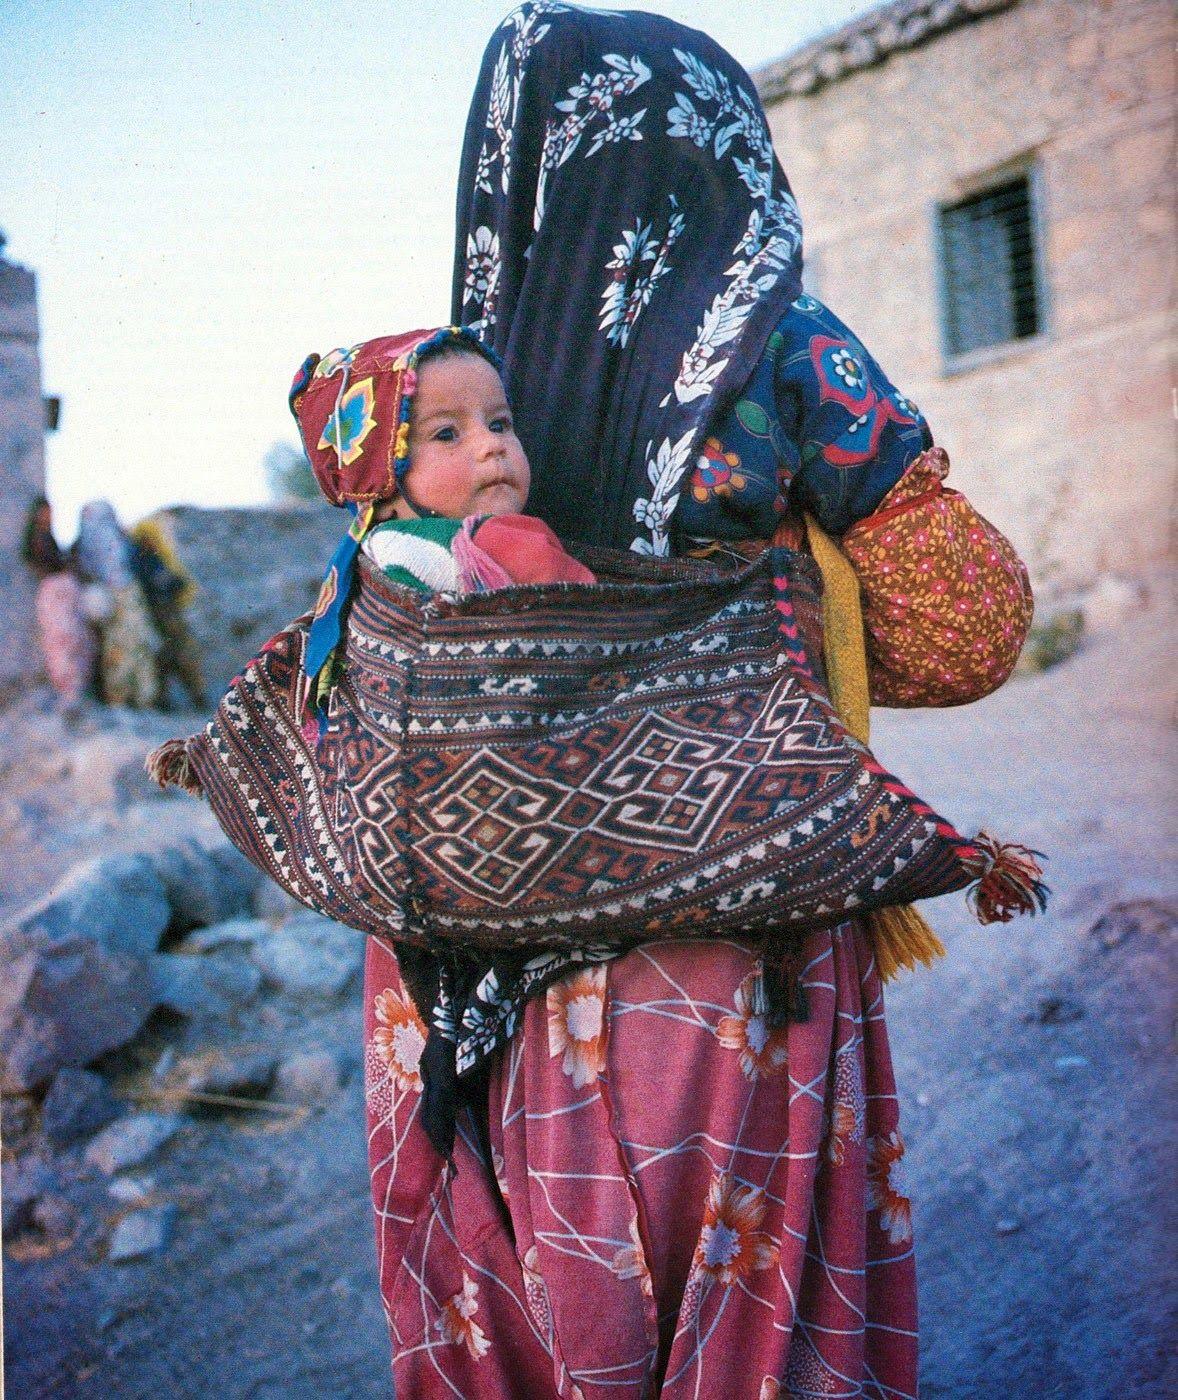 The nomadic way of carrying babies, Shavak tribeswoman Tunceli, Eastern Turkey, 1988